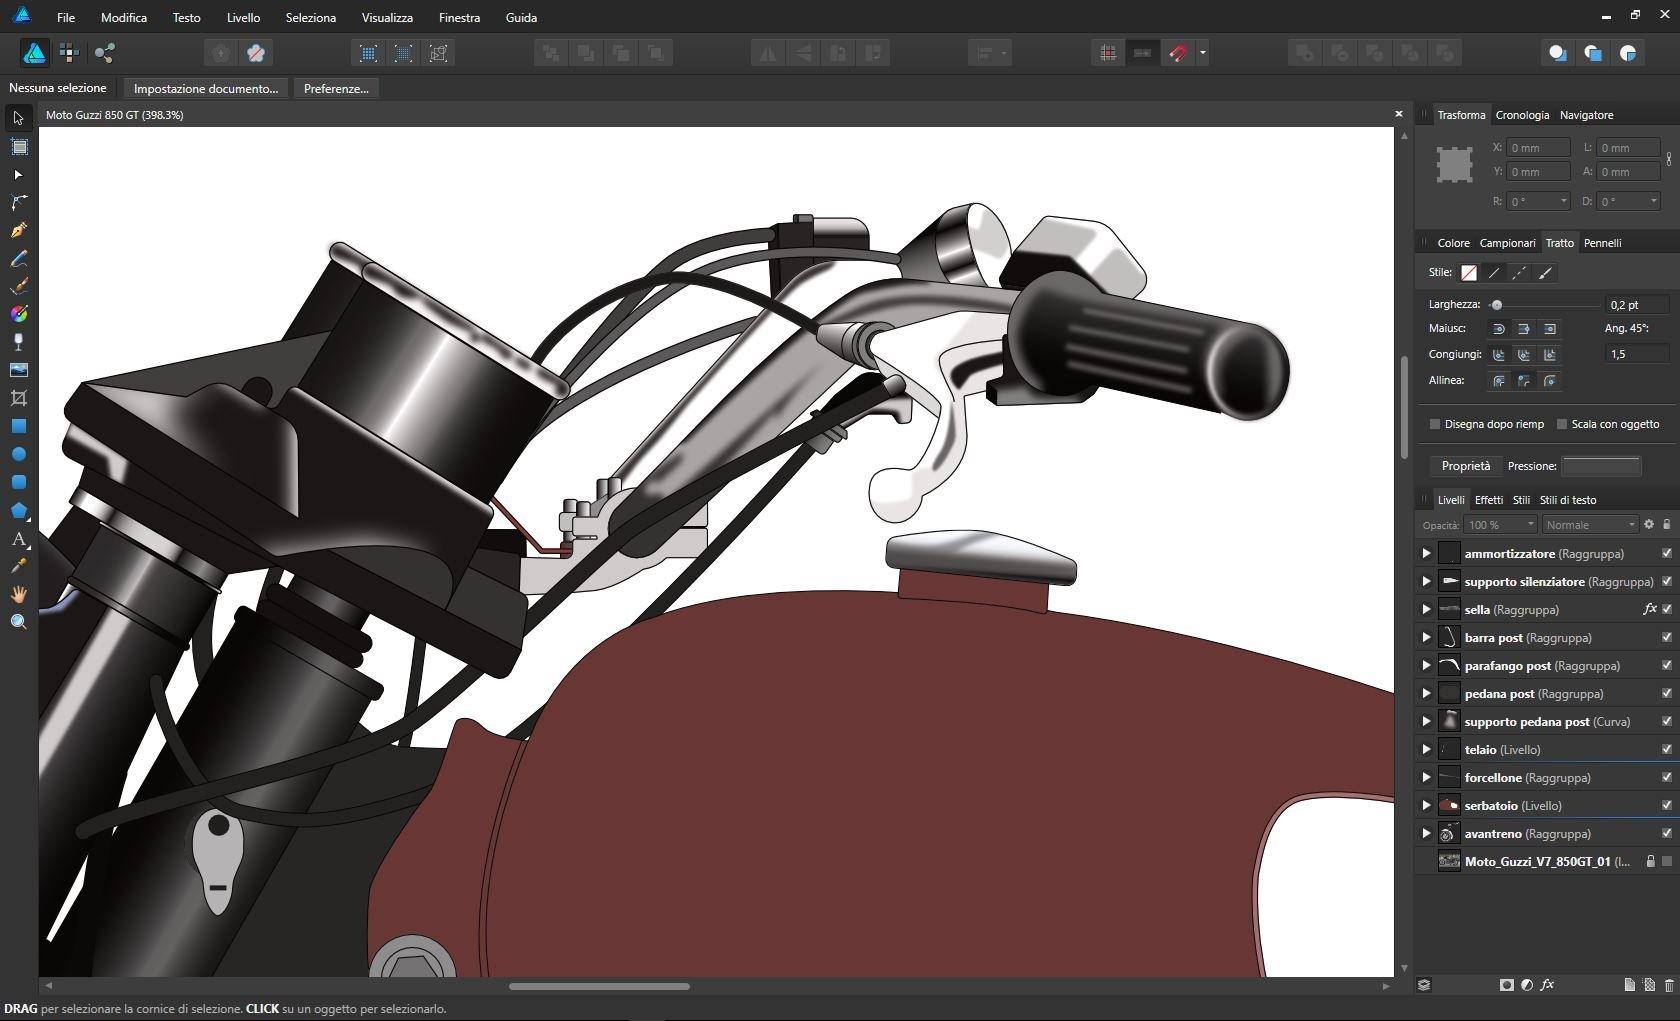 Moto Guzzi Design - Share your work - Affinity | Forum